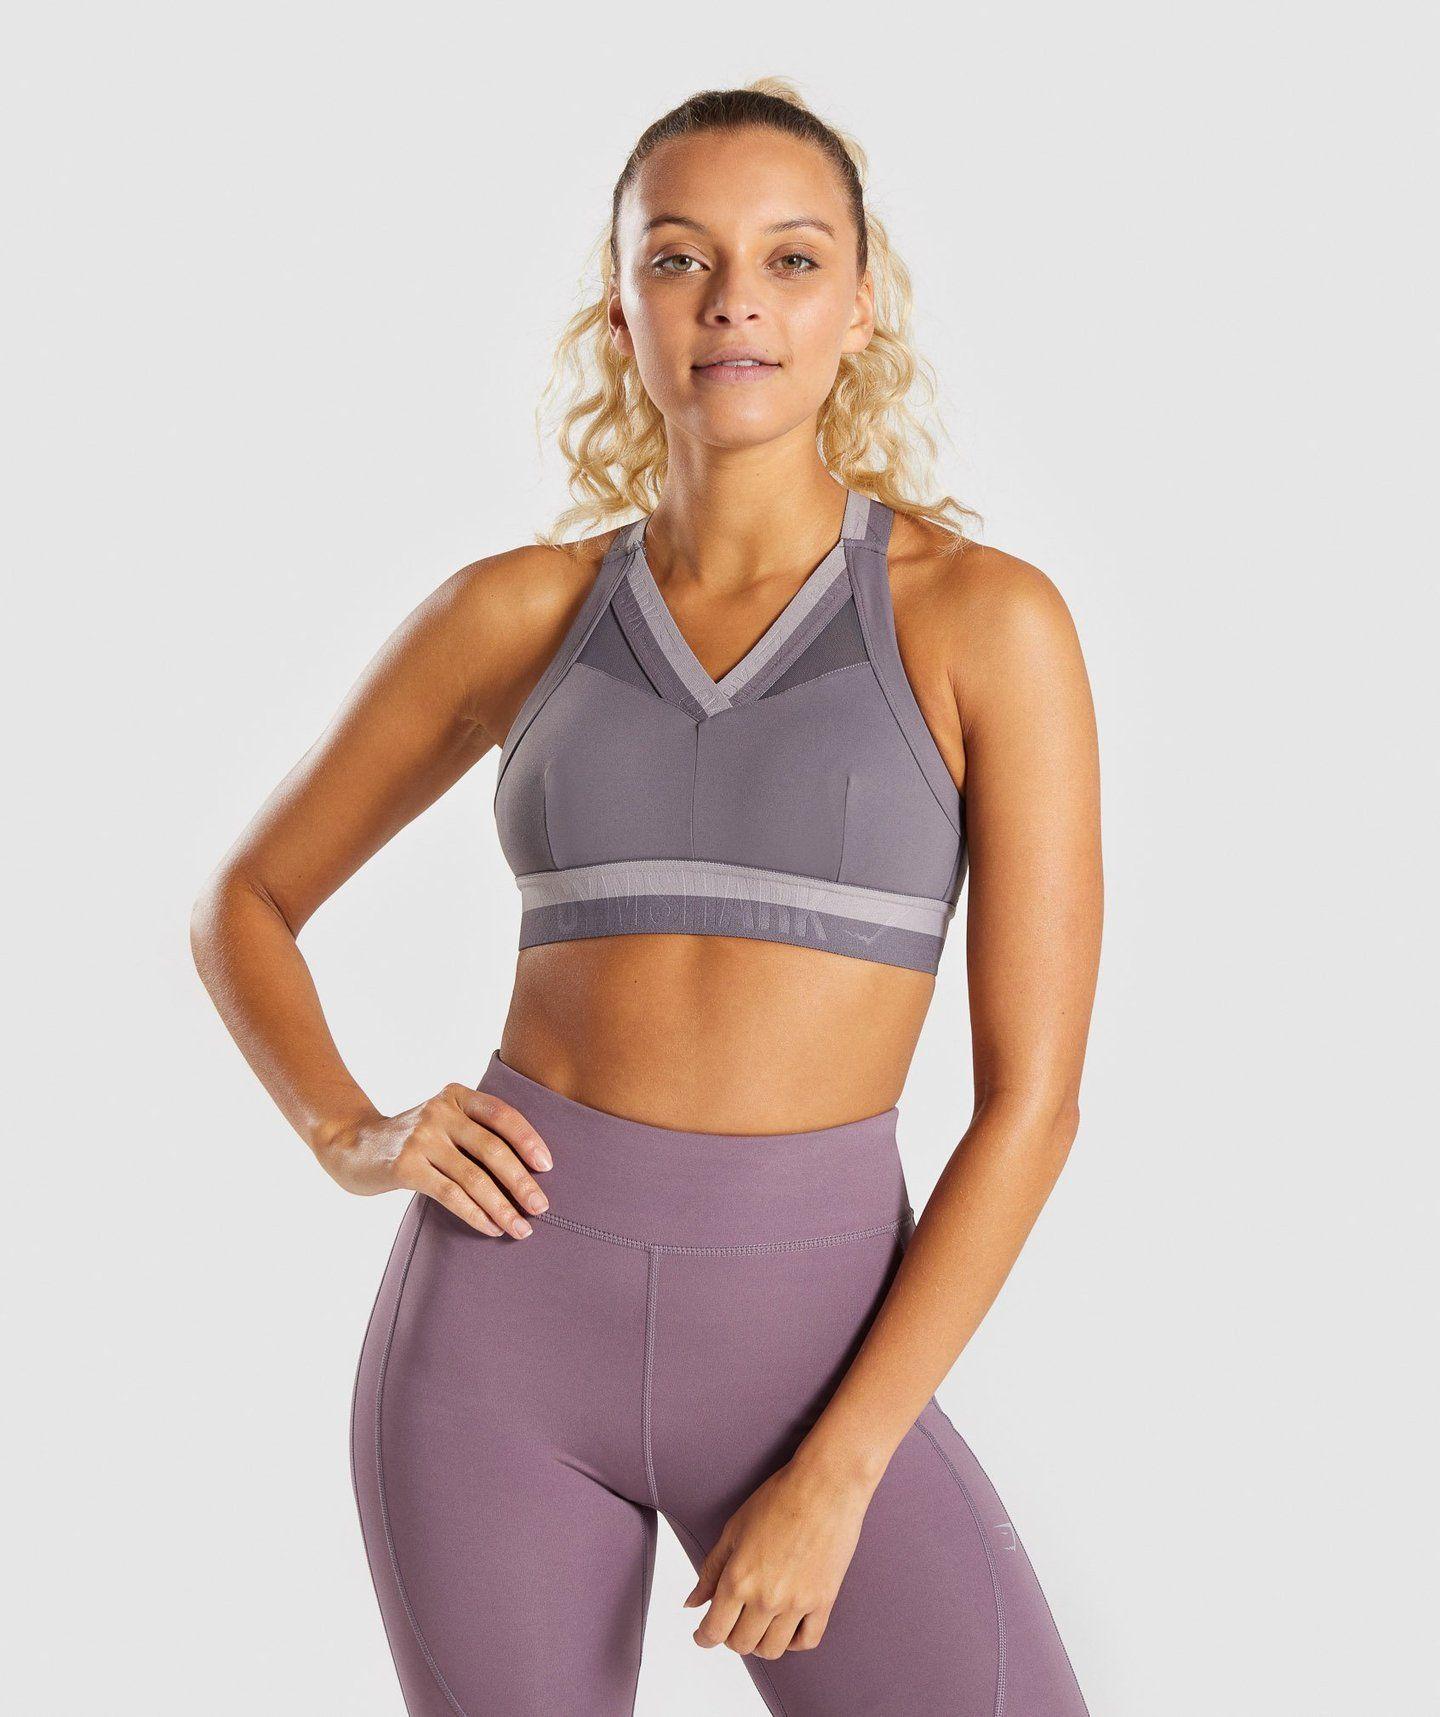 acf058f72c6f8 Gymshark Empower Sports Bra - Slate Lavender in 2019